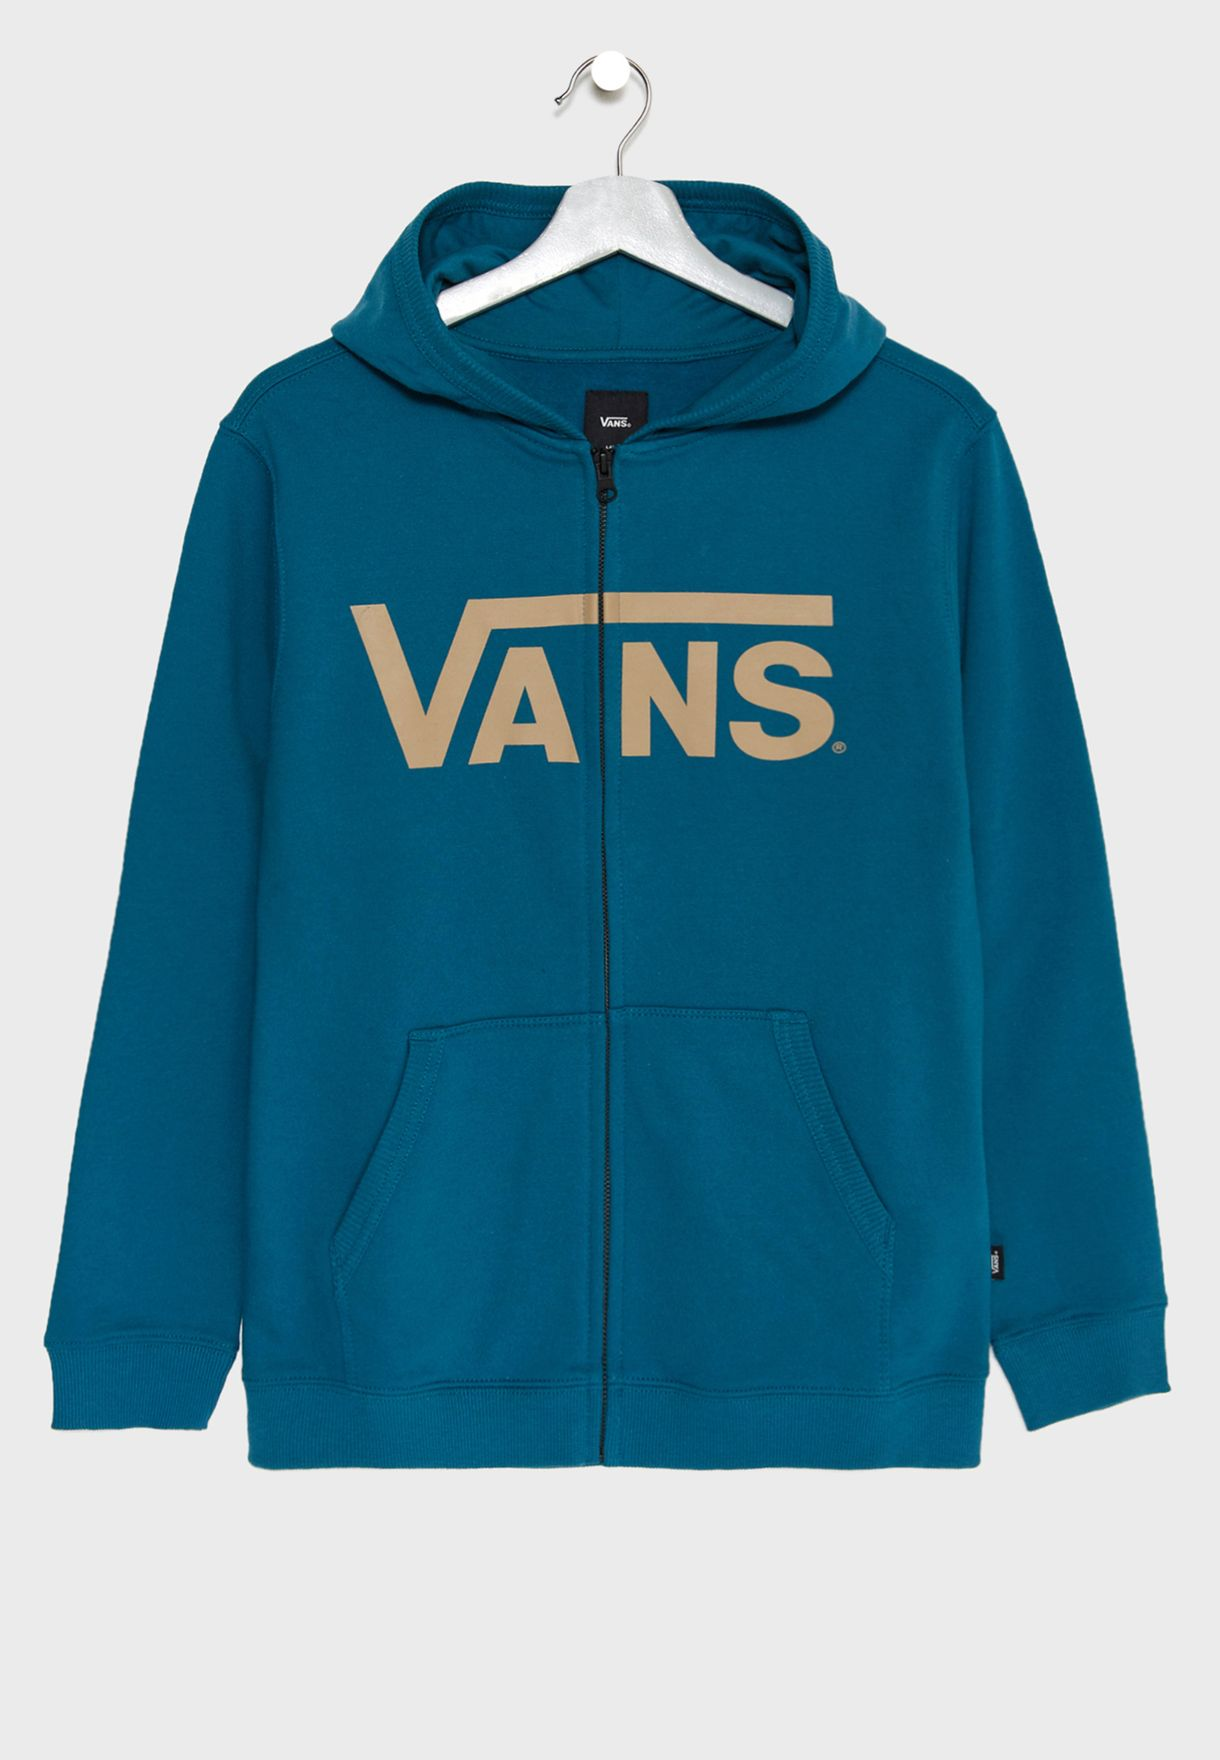 96d5355a7a43 Shop Vans blue Kids Classic Hoodie V00J6LRQB for Kids in Qatar -  VA088AT05GAO